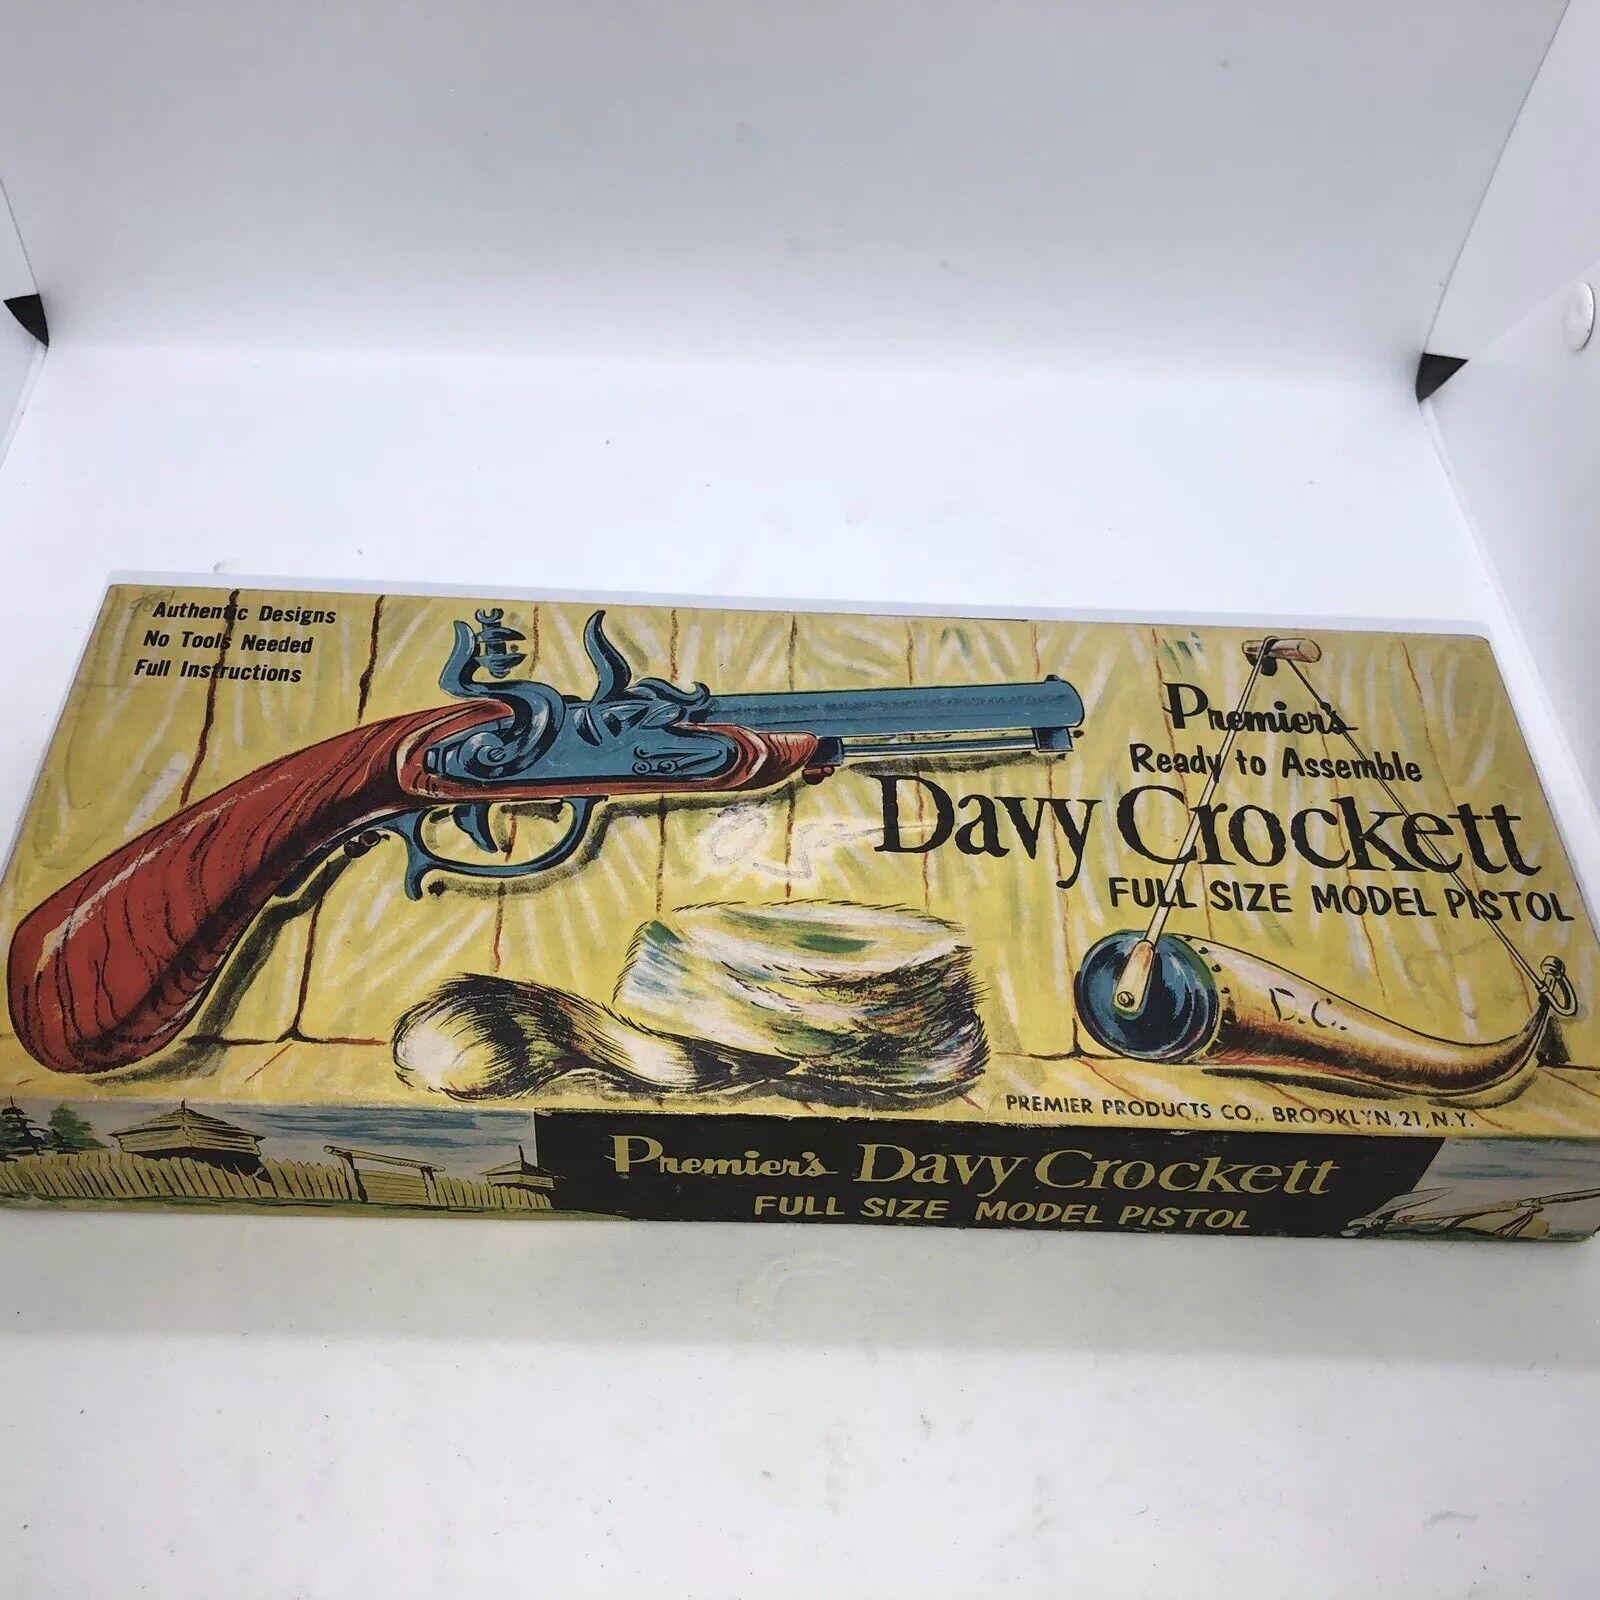 Premier's Davy Crockett Tamaño Completo Vintage Modelo pistola sin edifiCoche